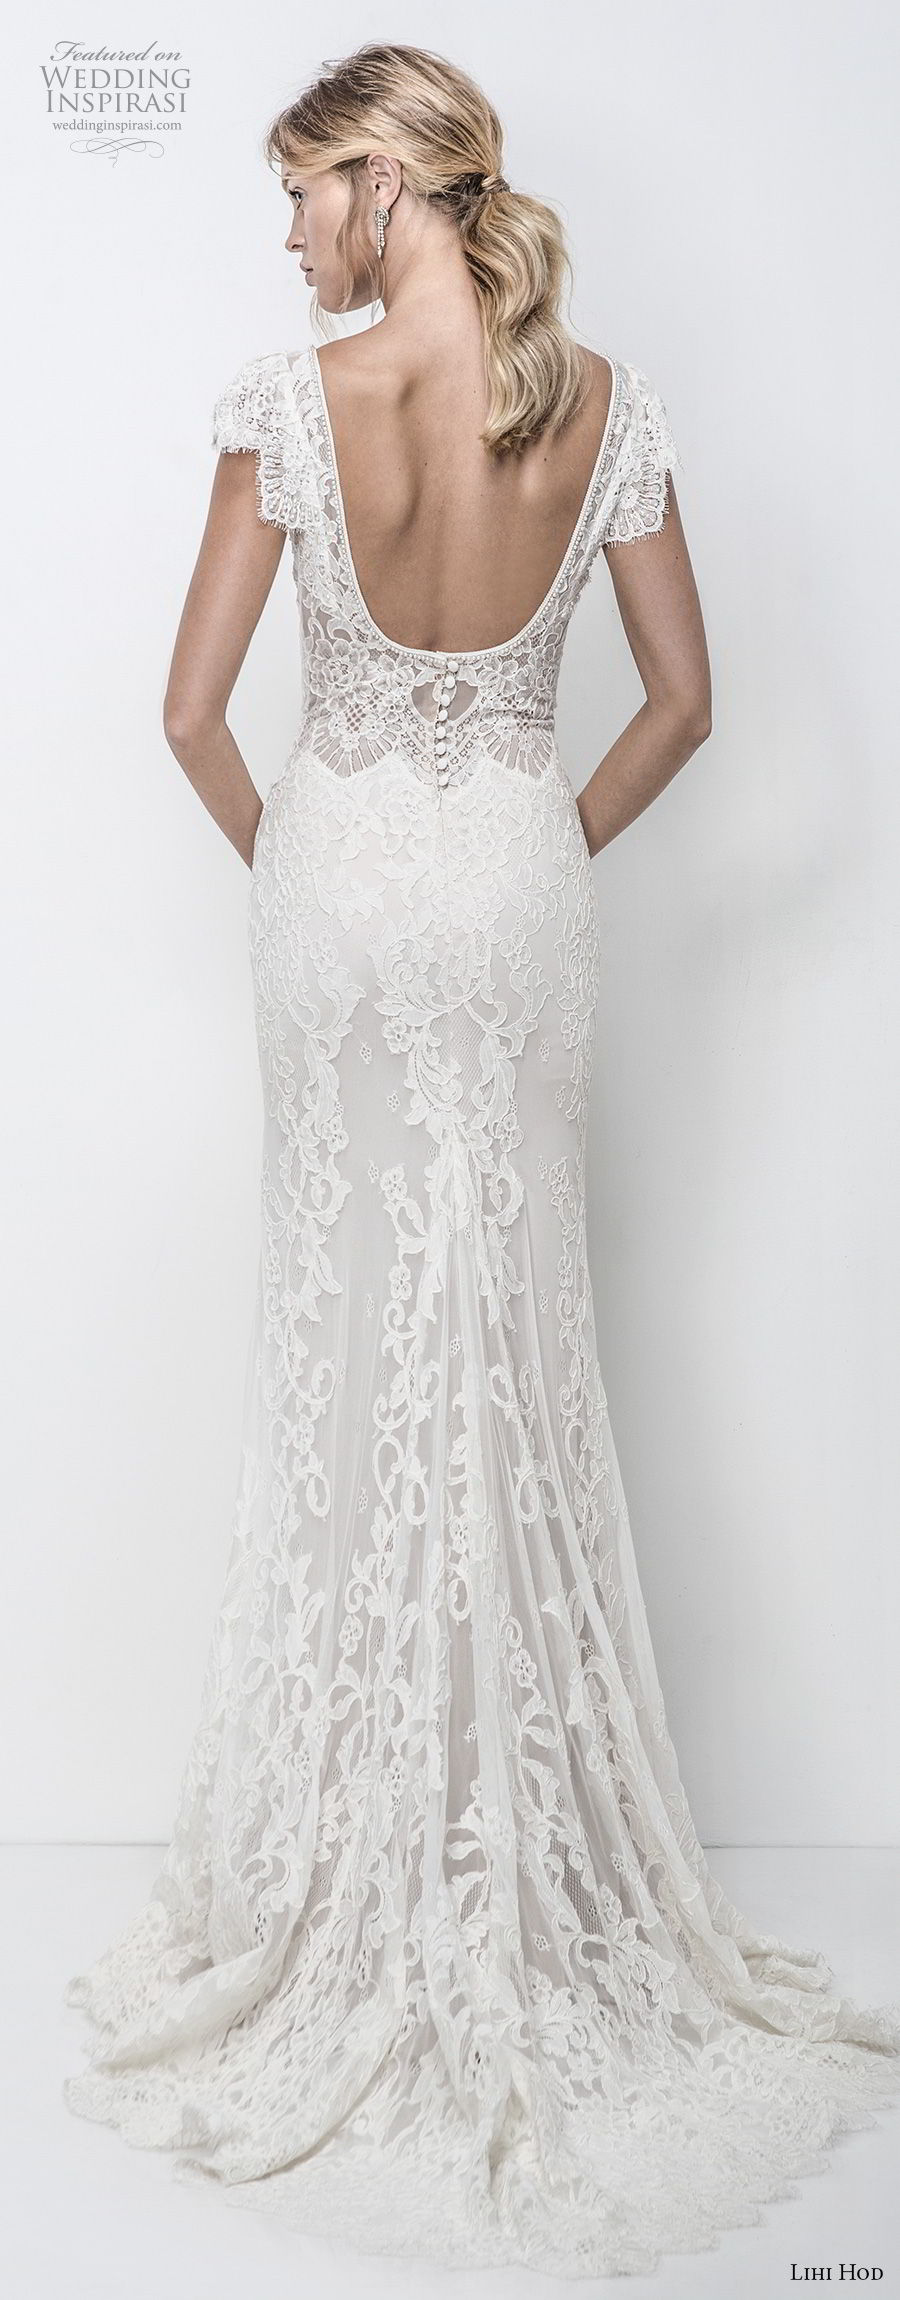 lihi hod 2018 bridal cap sleeves v neck full embellishment elegant romantic fit and flare sheath wedding dress open scoop back sweep train (8)  bv